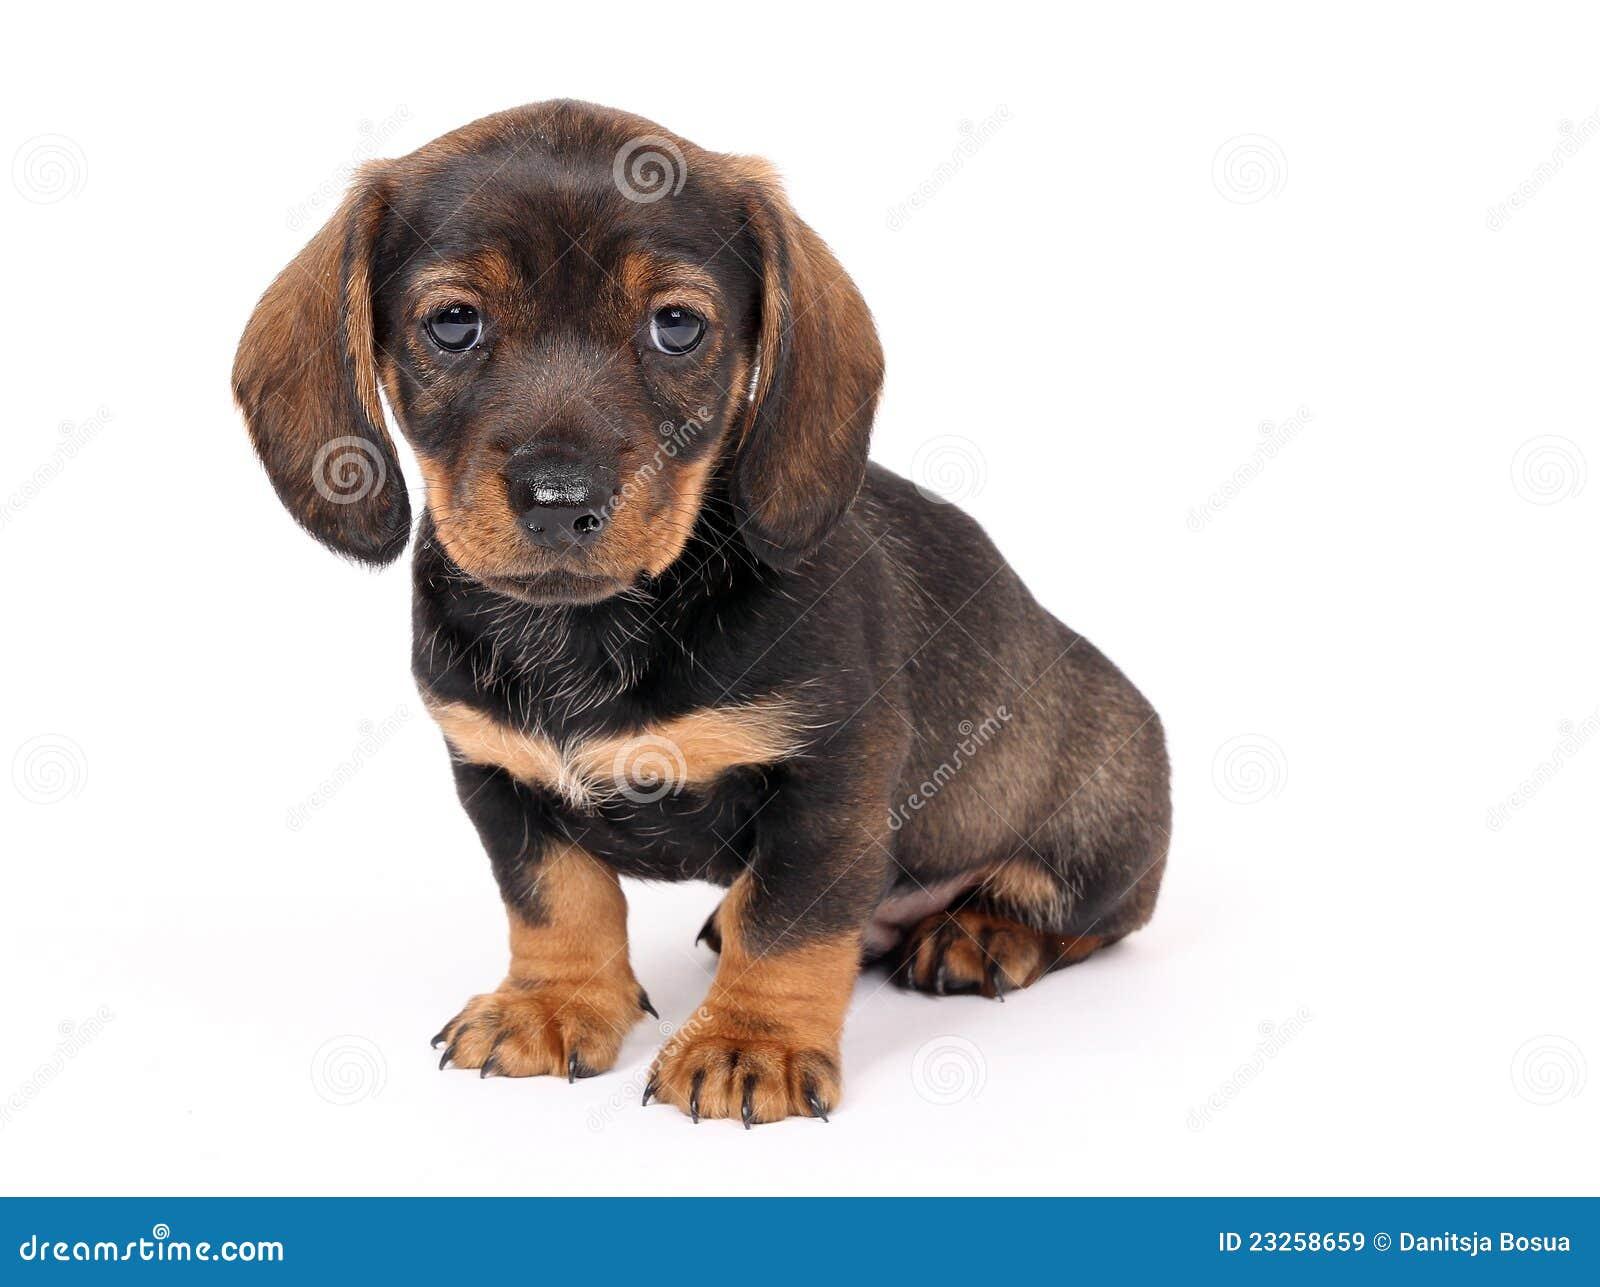 Dog Teckel Puppies